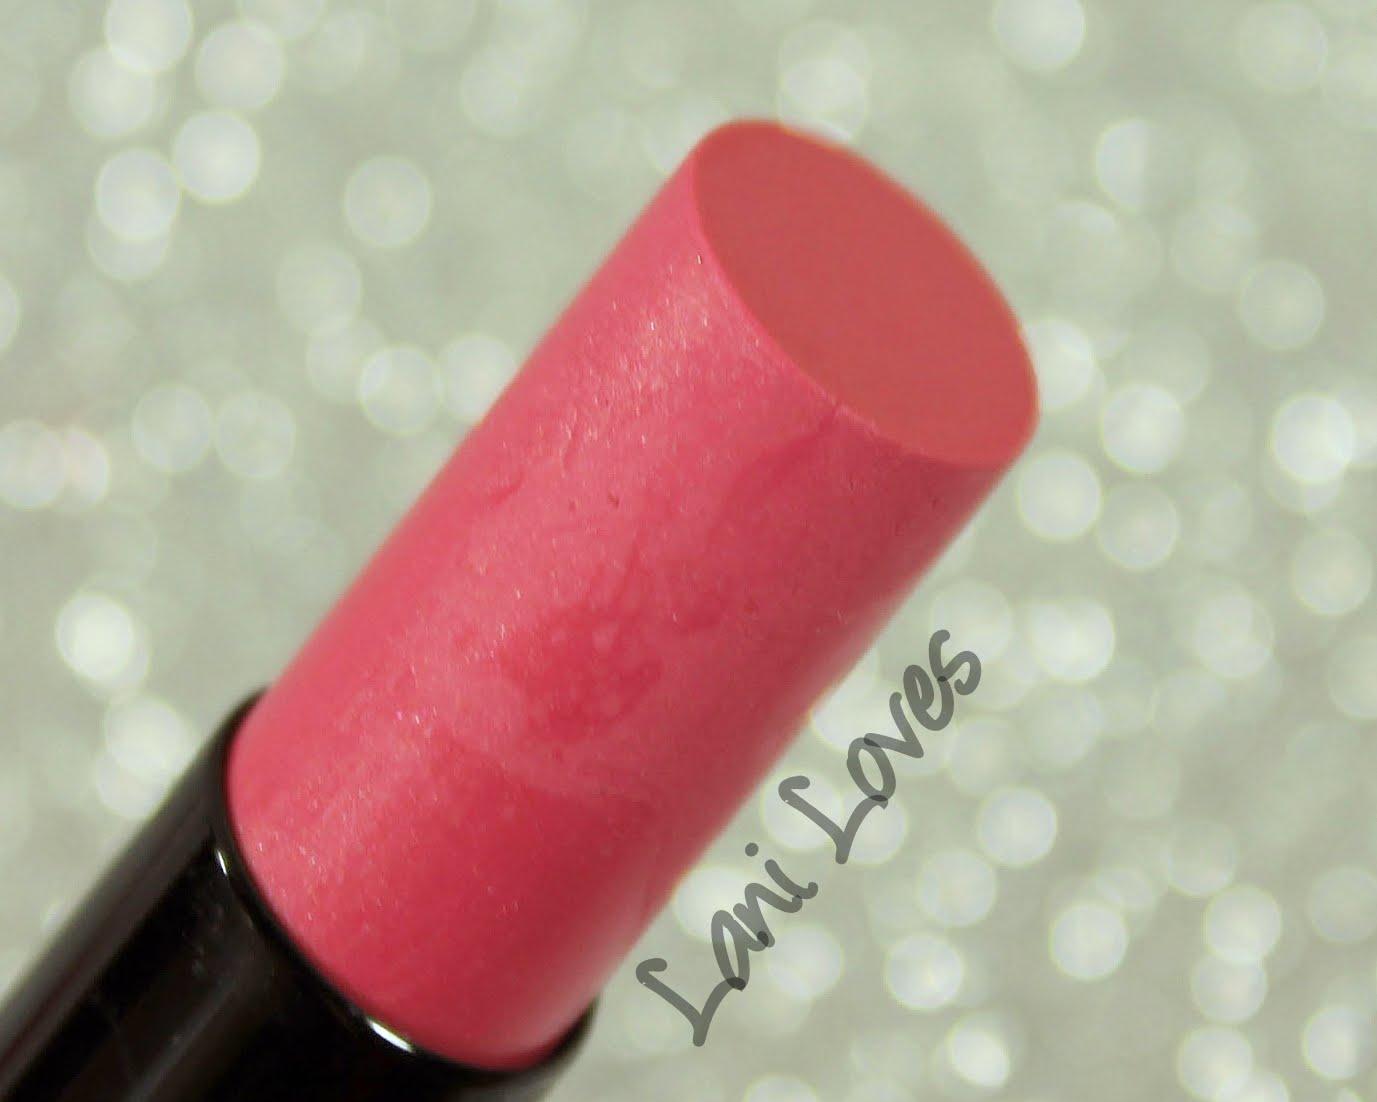 ZA Vibrant Moist Lipstick - RS371s swatches & review